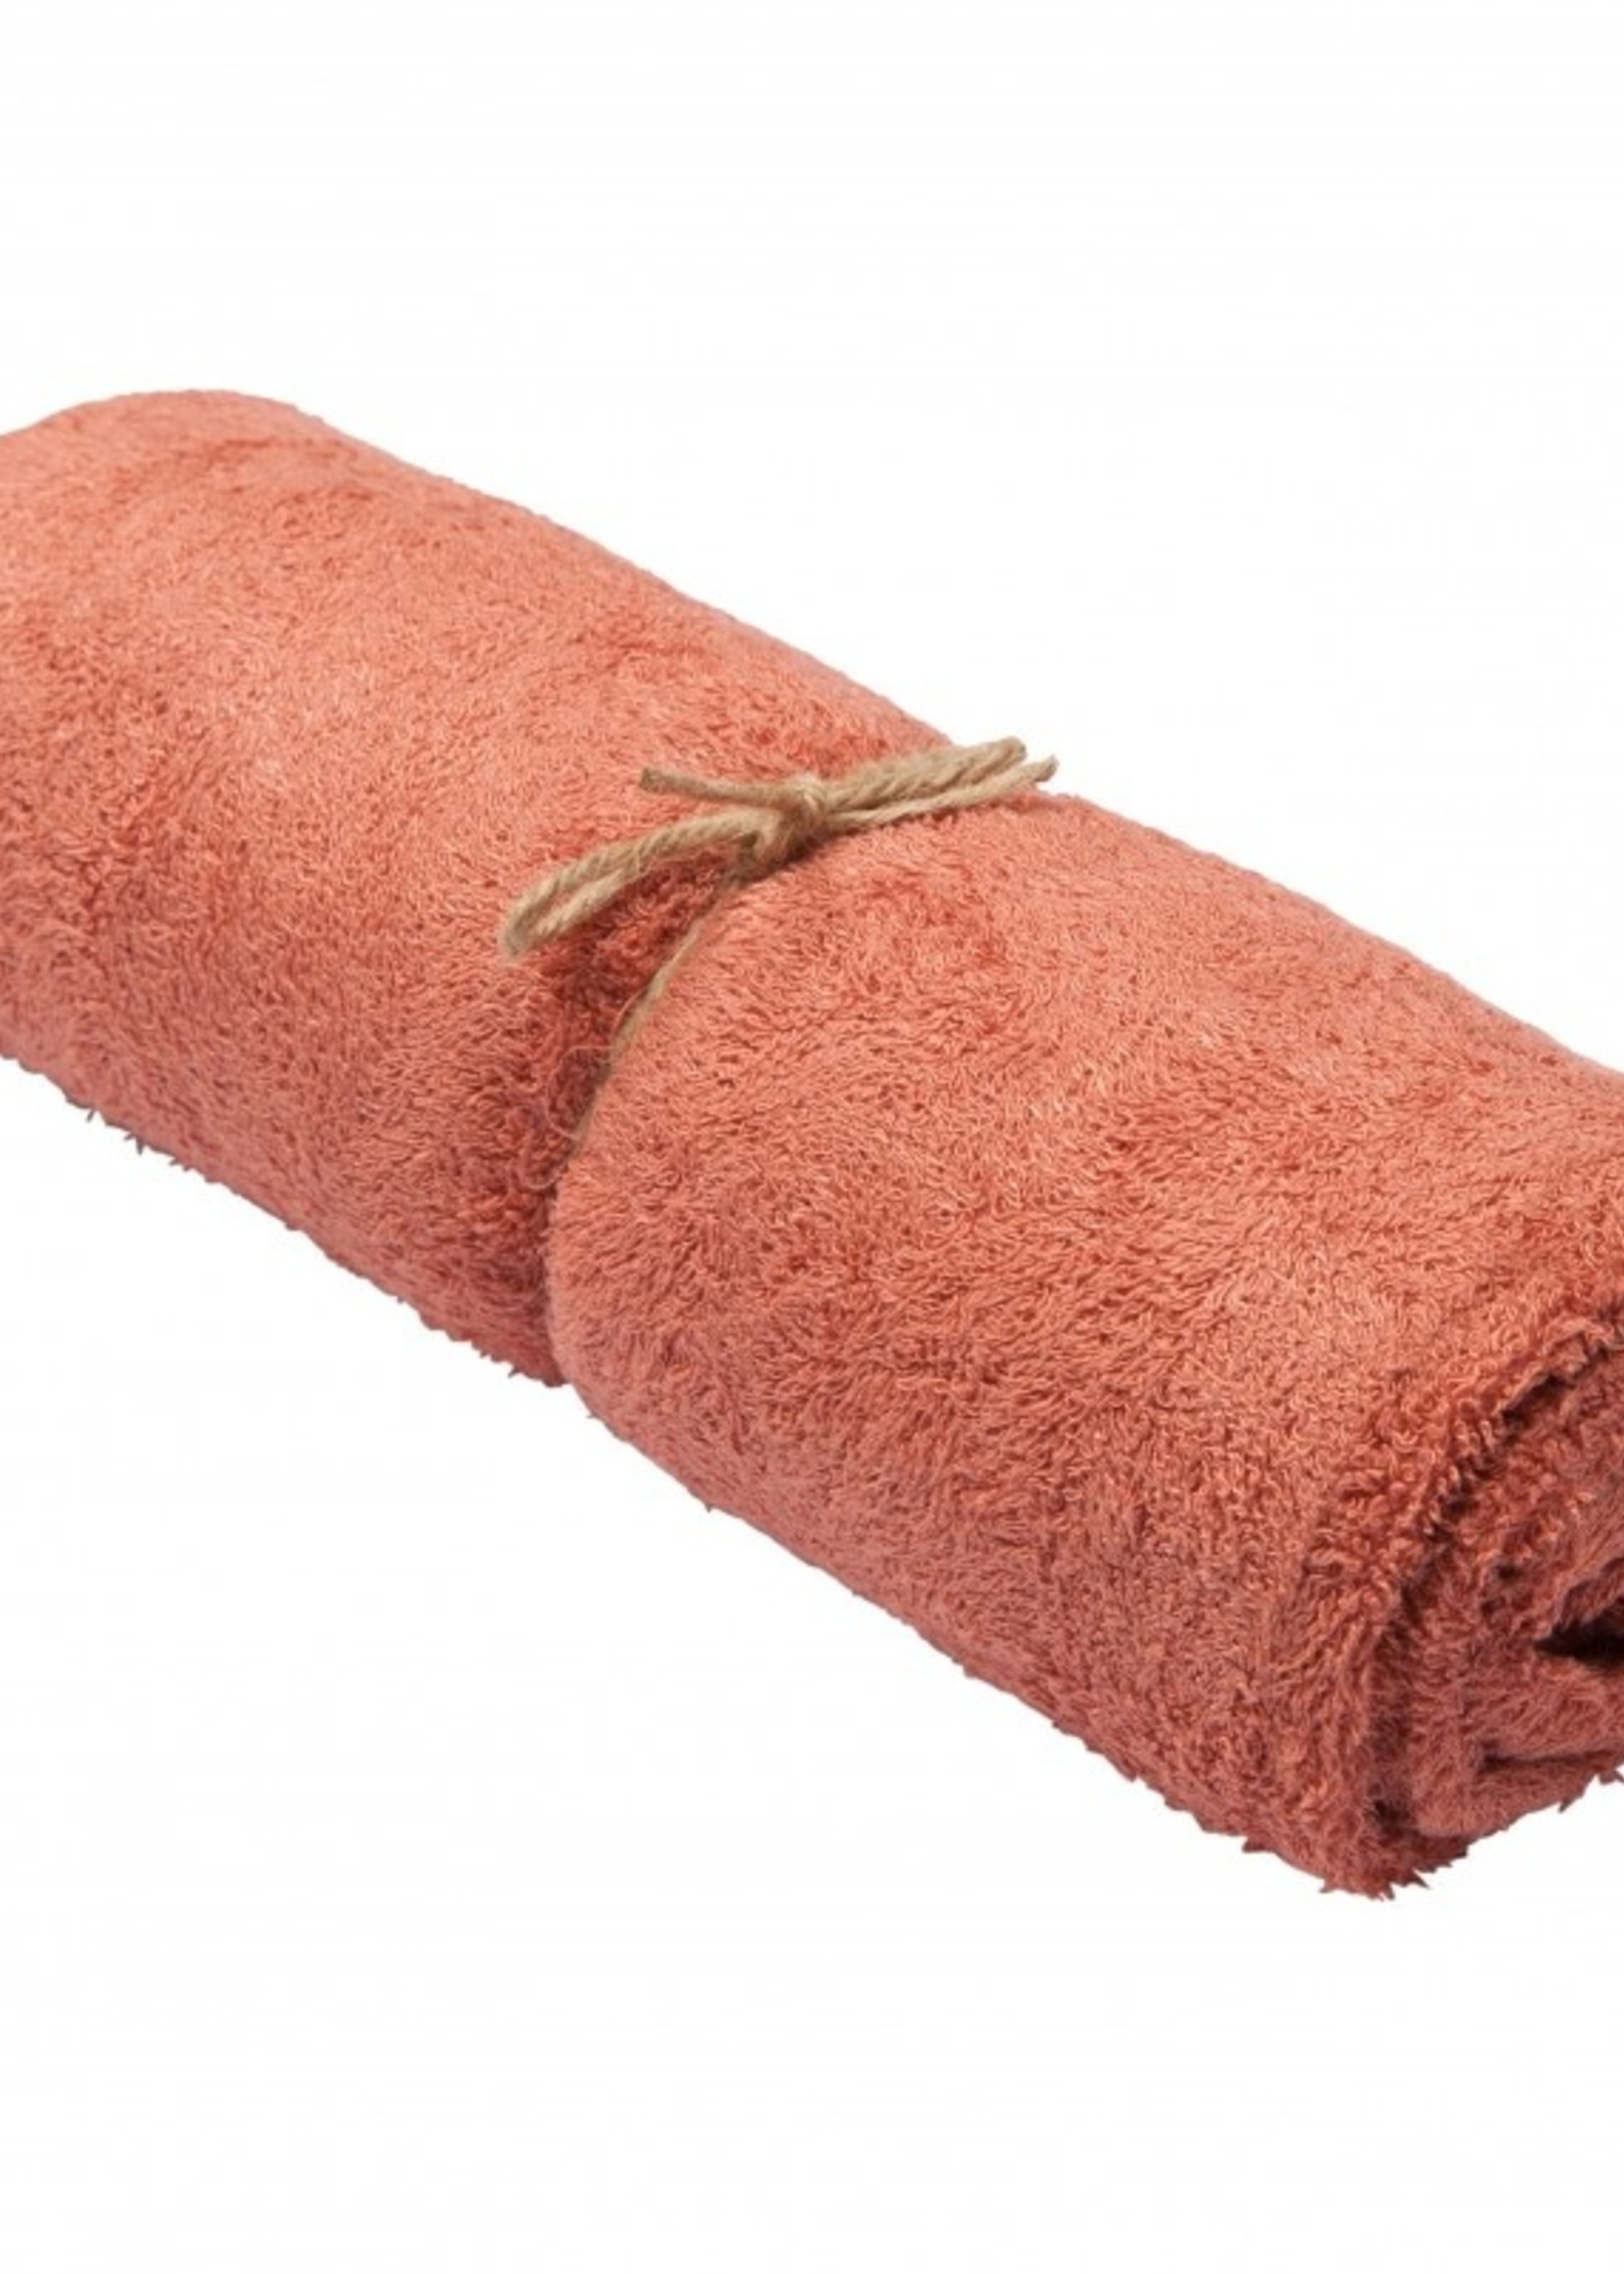 Timboo Towel Large - Apricot Blush